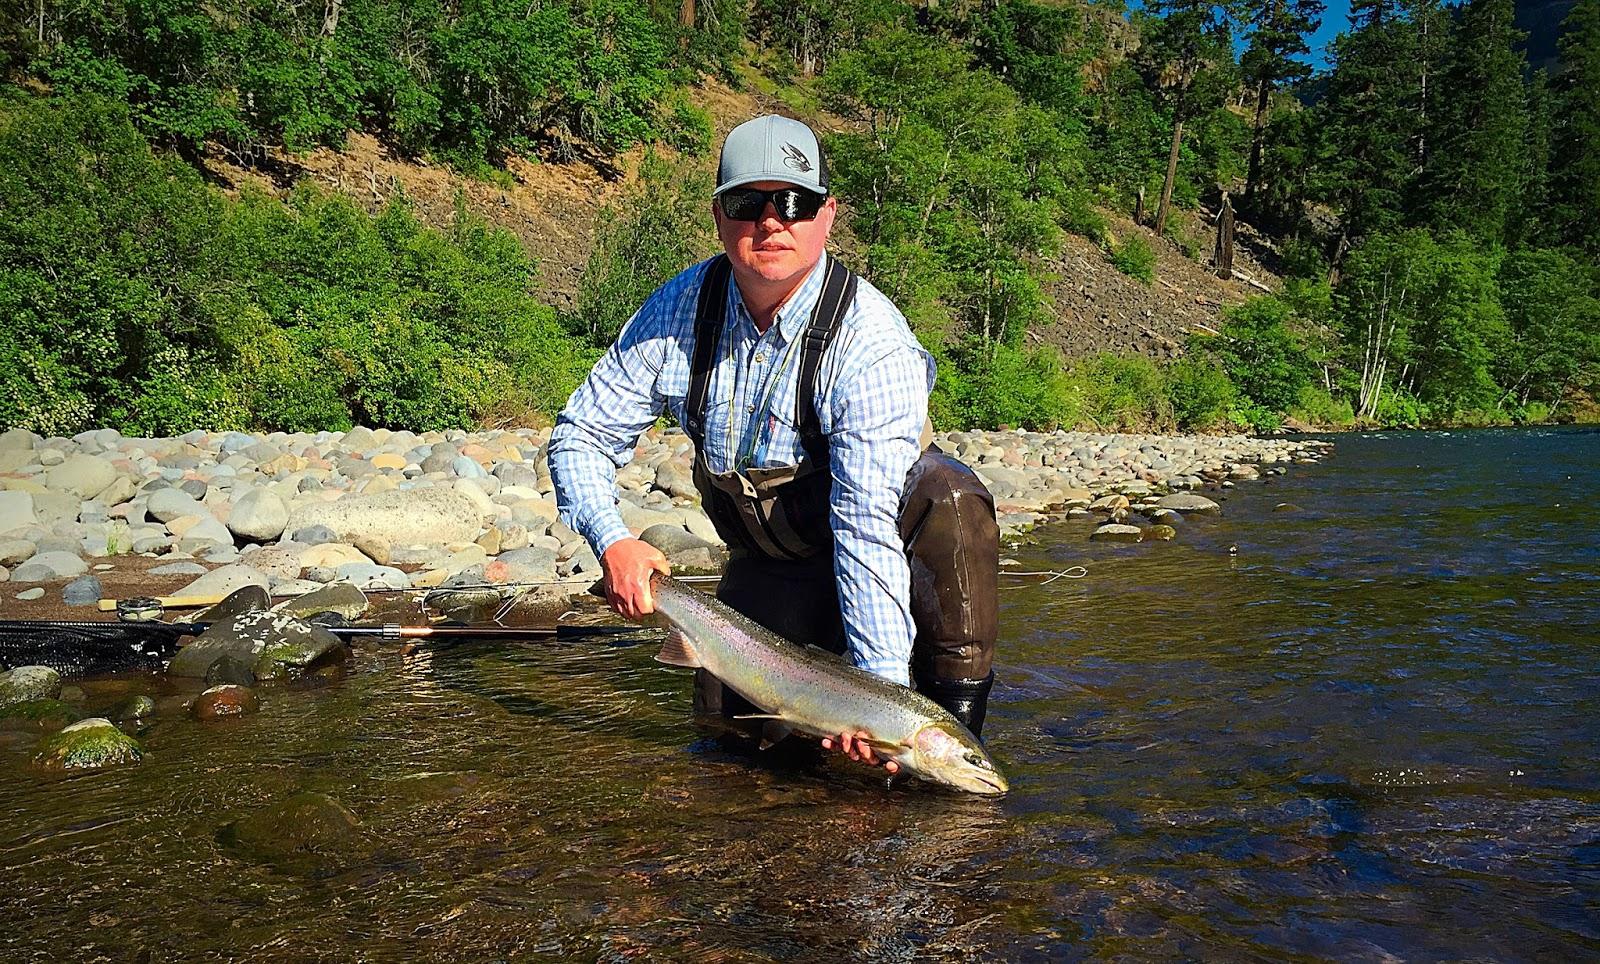 The evening hatch reports klickitat river june 5 2015 for Klickitat river fishing report